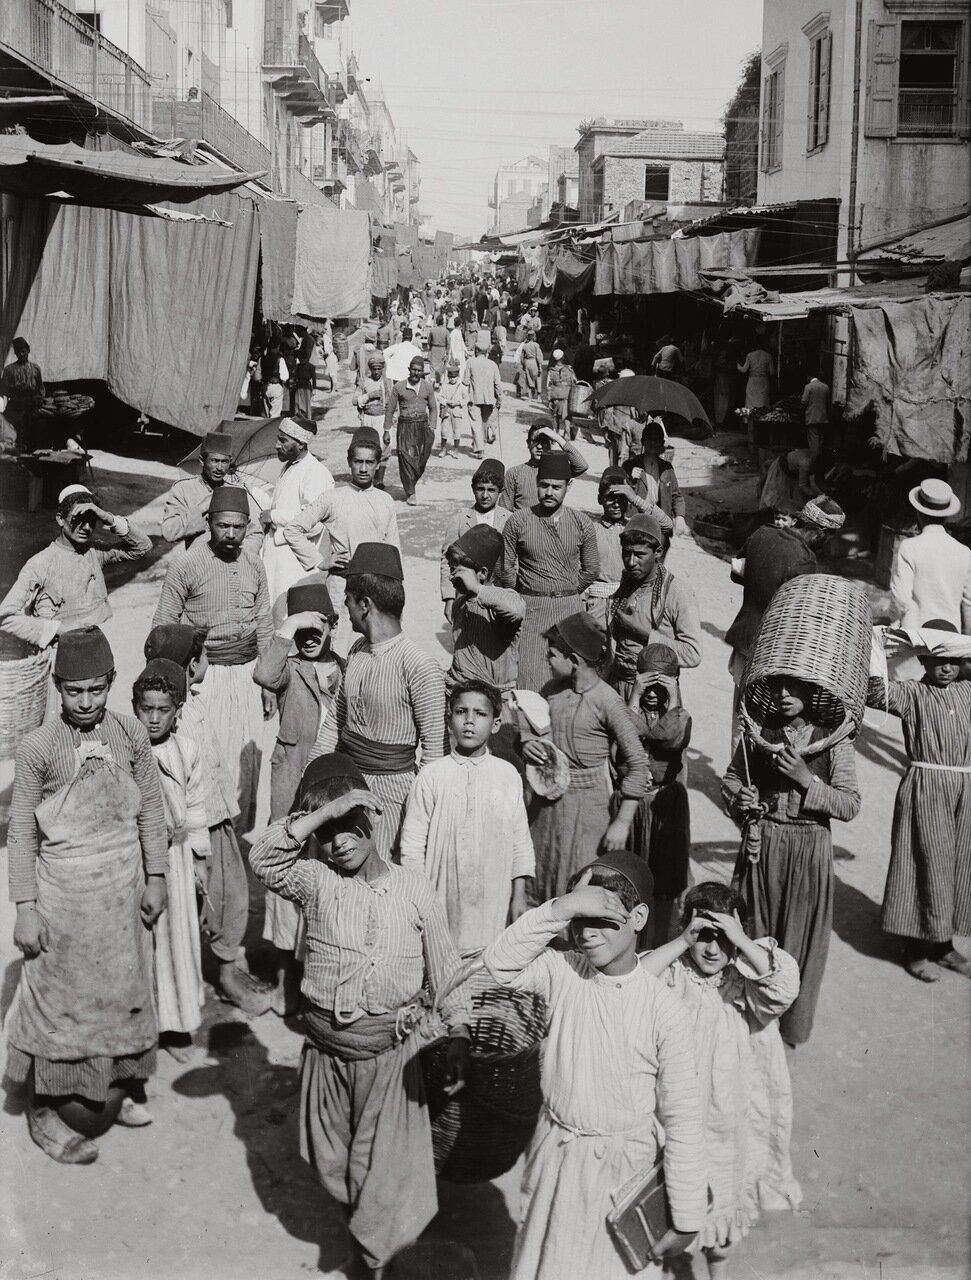 Овощной рынок. Бейрут, Ливан. 1900-1920 гг.